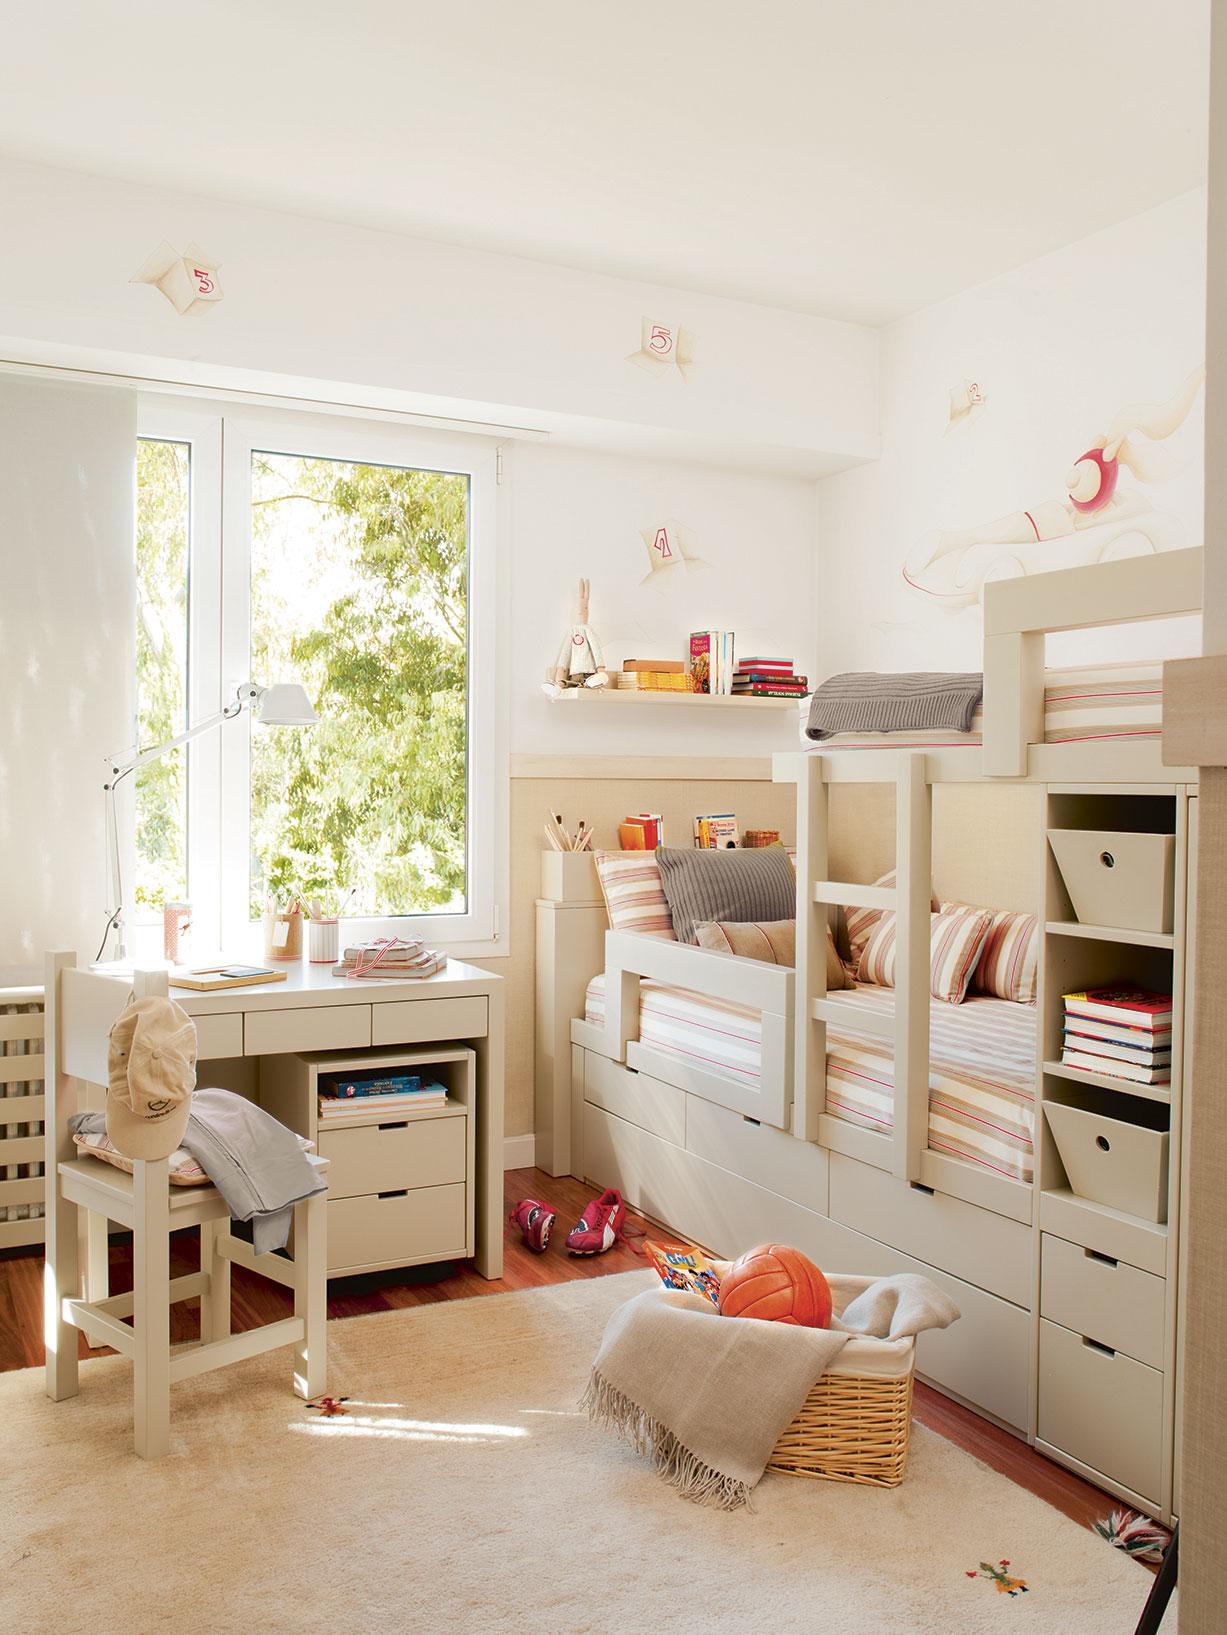 Soluciones para cuartos de ni os peque os - Literas ninos pequenos ...